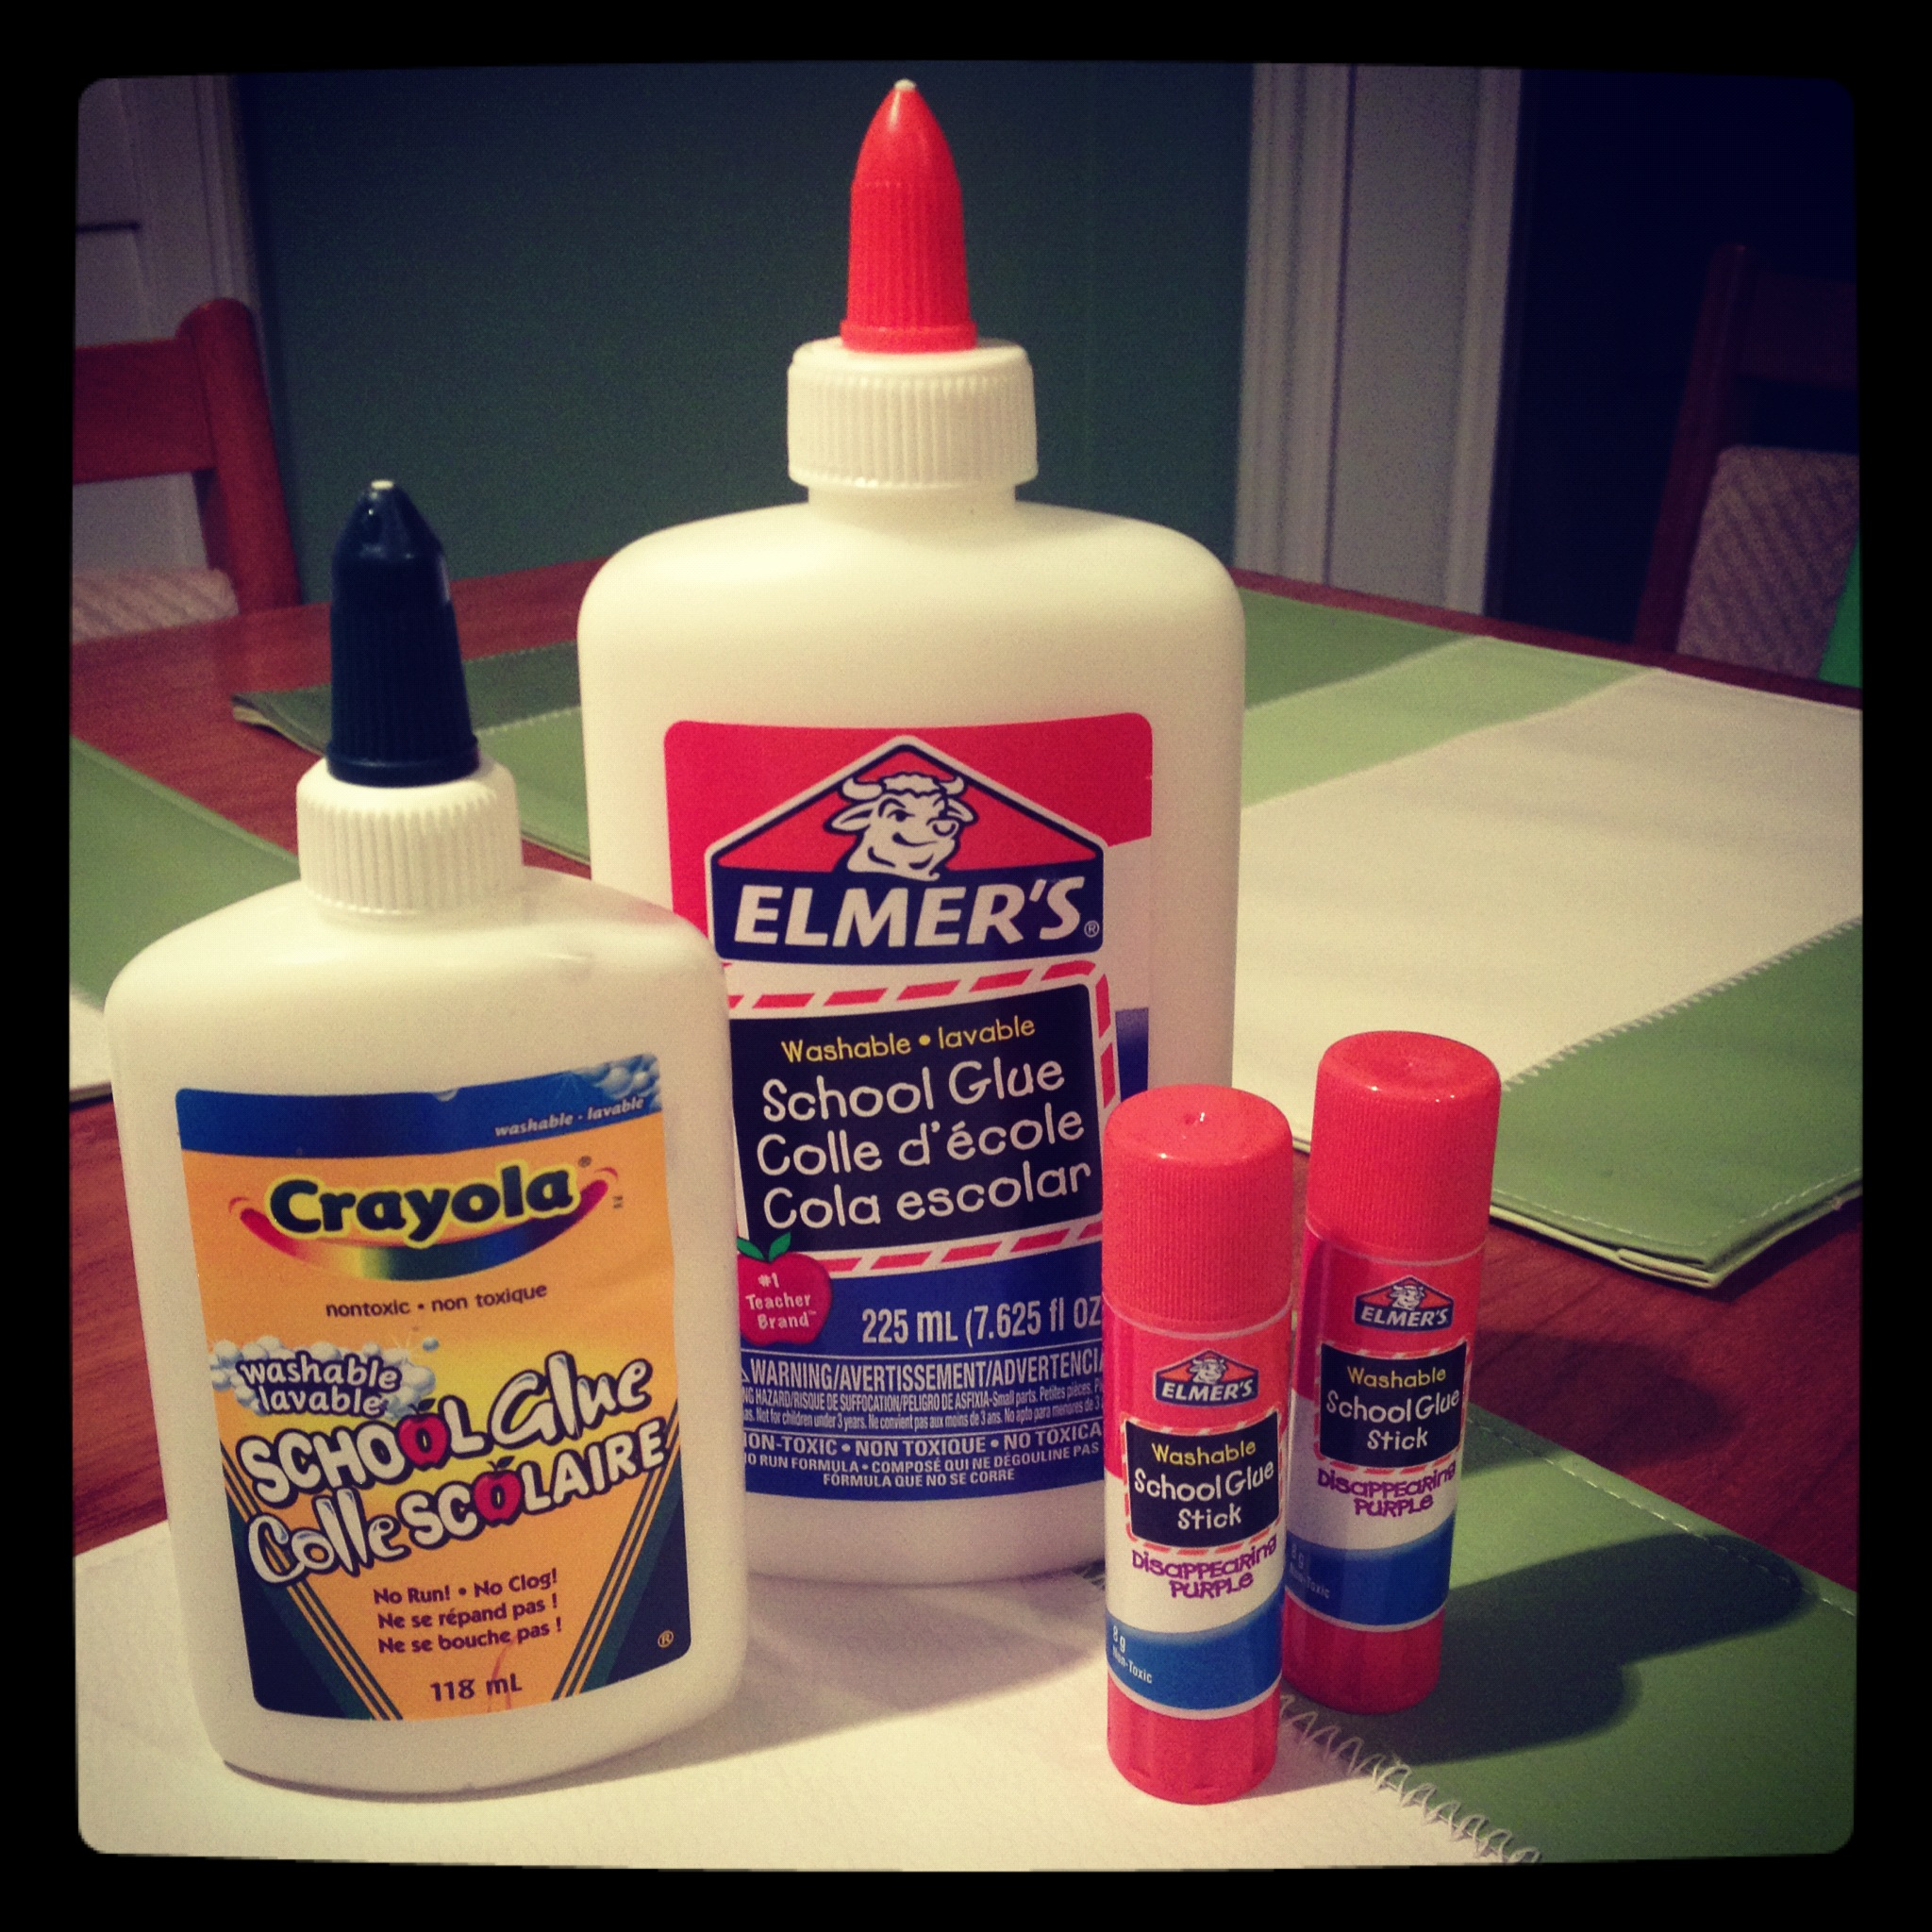 I'm grateful for glue